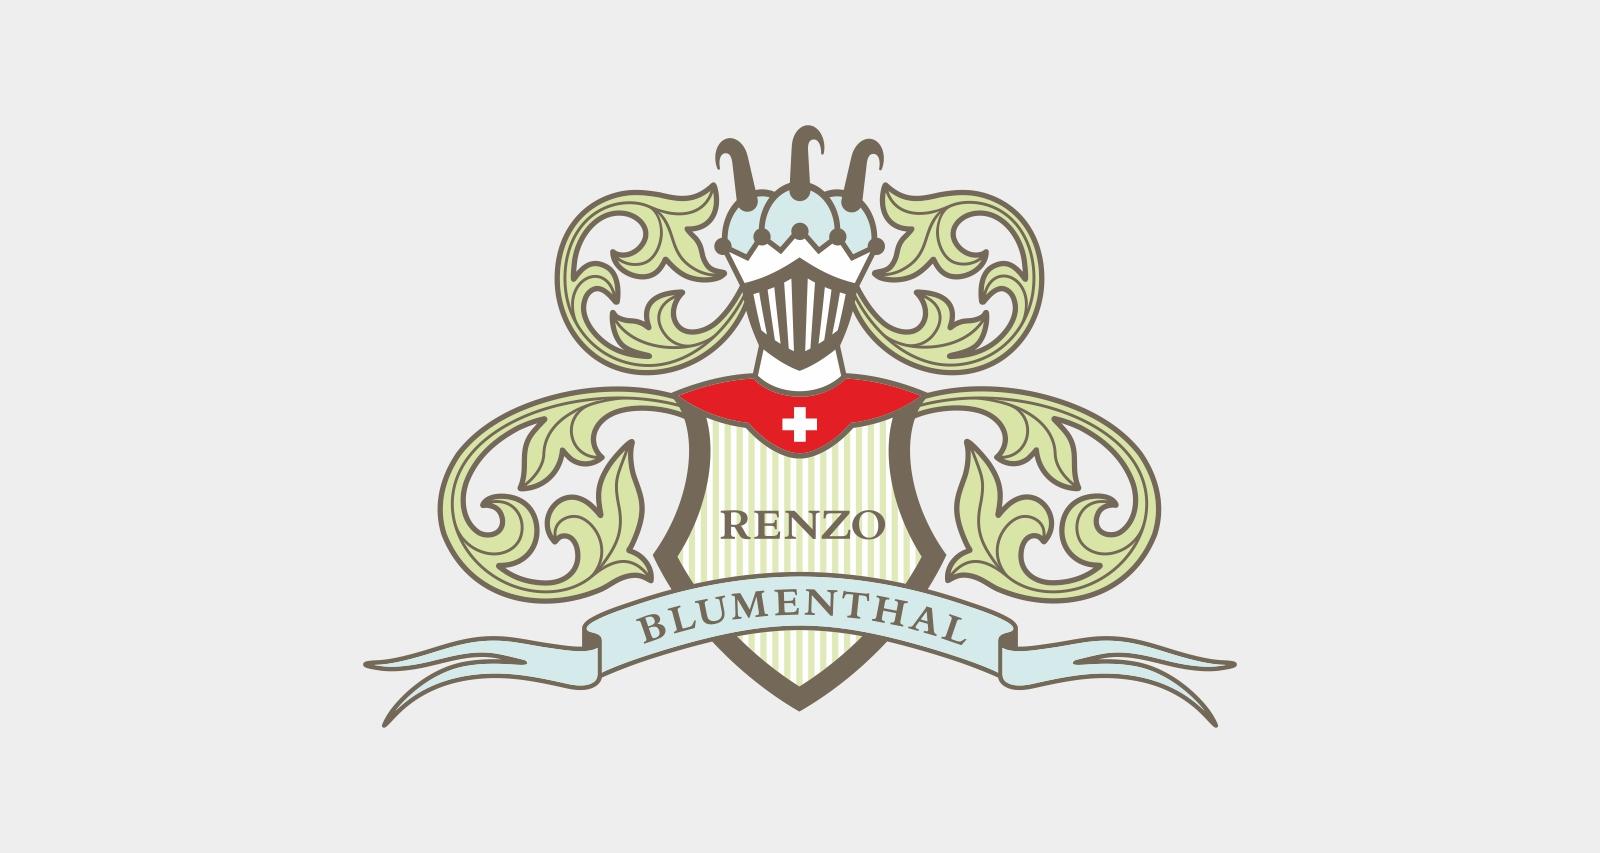 RENZO BLUMENTHAL